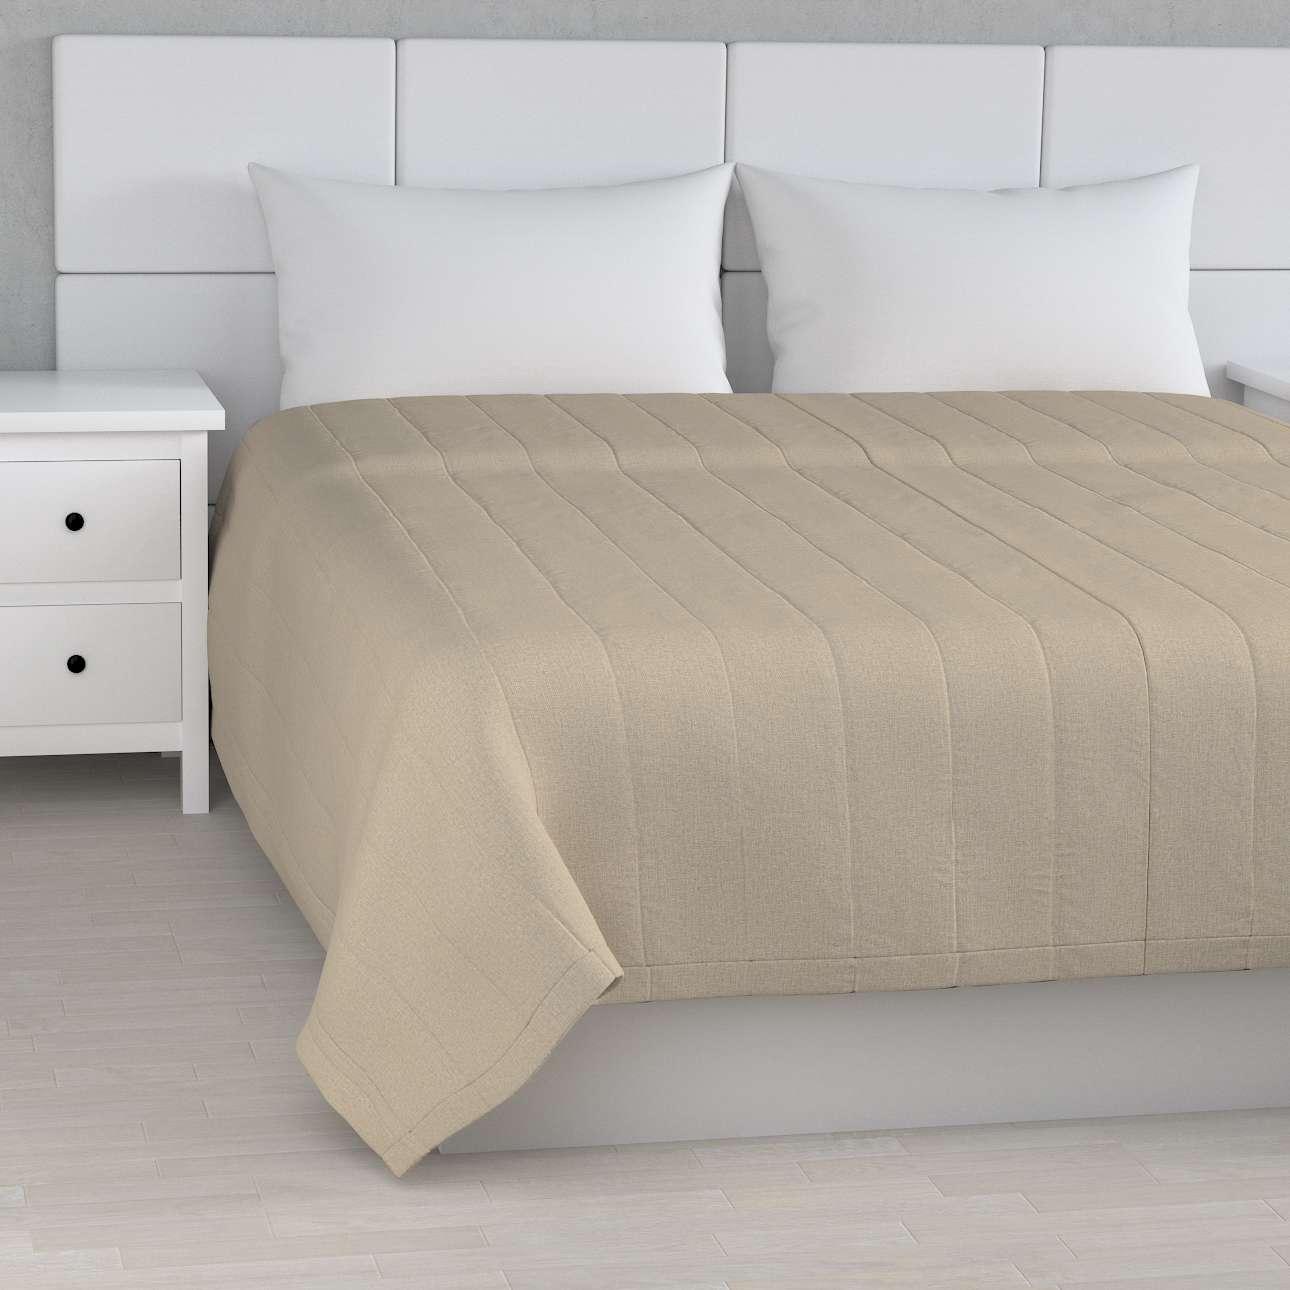 Basic steppelt takaró a kollekcióból Edinburgh Bútorszövet, Dekoranyag: 115-78